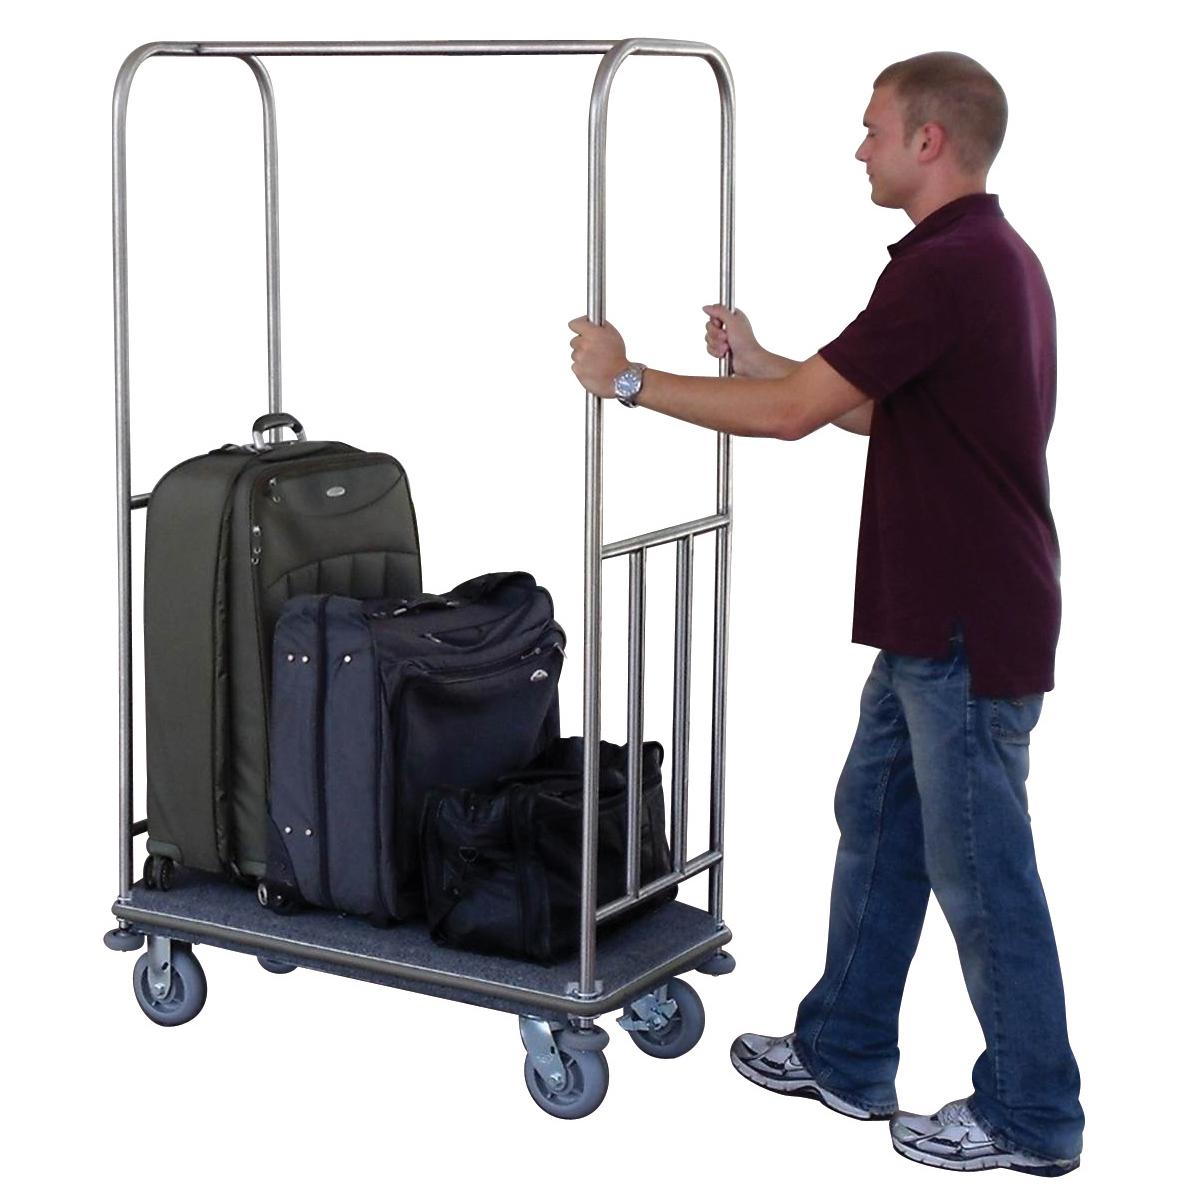 Luggage Carts – TQ Hotel Carts